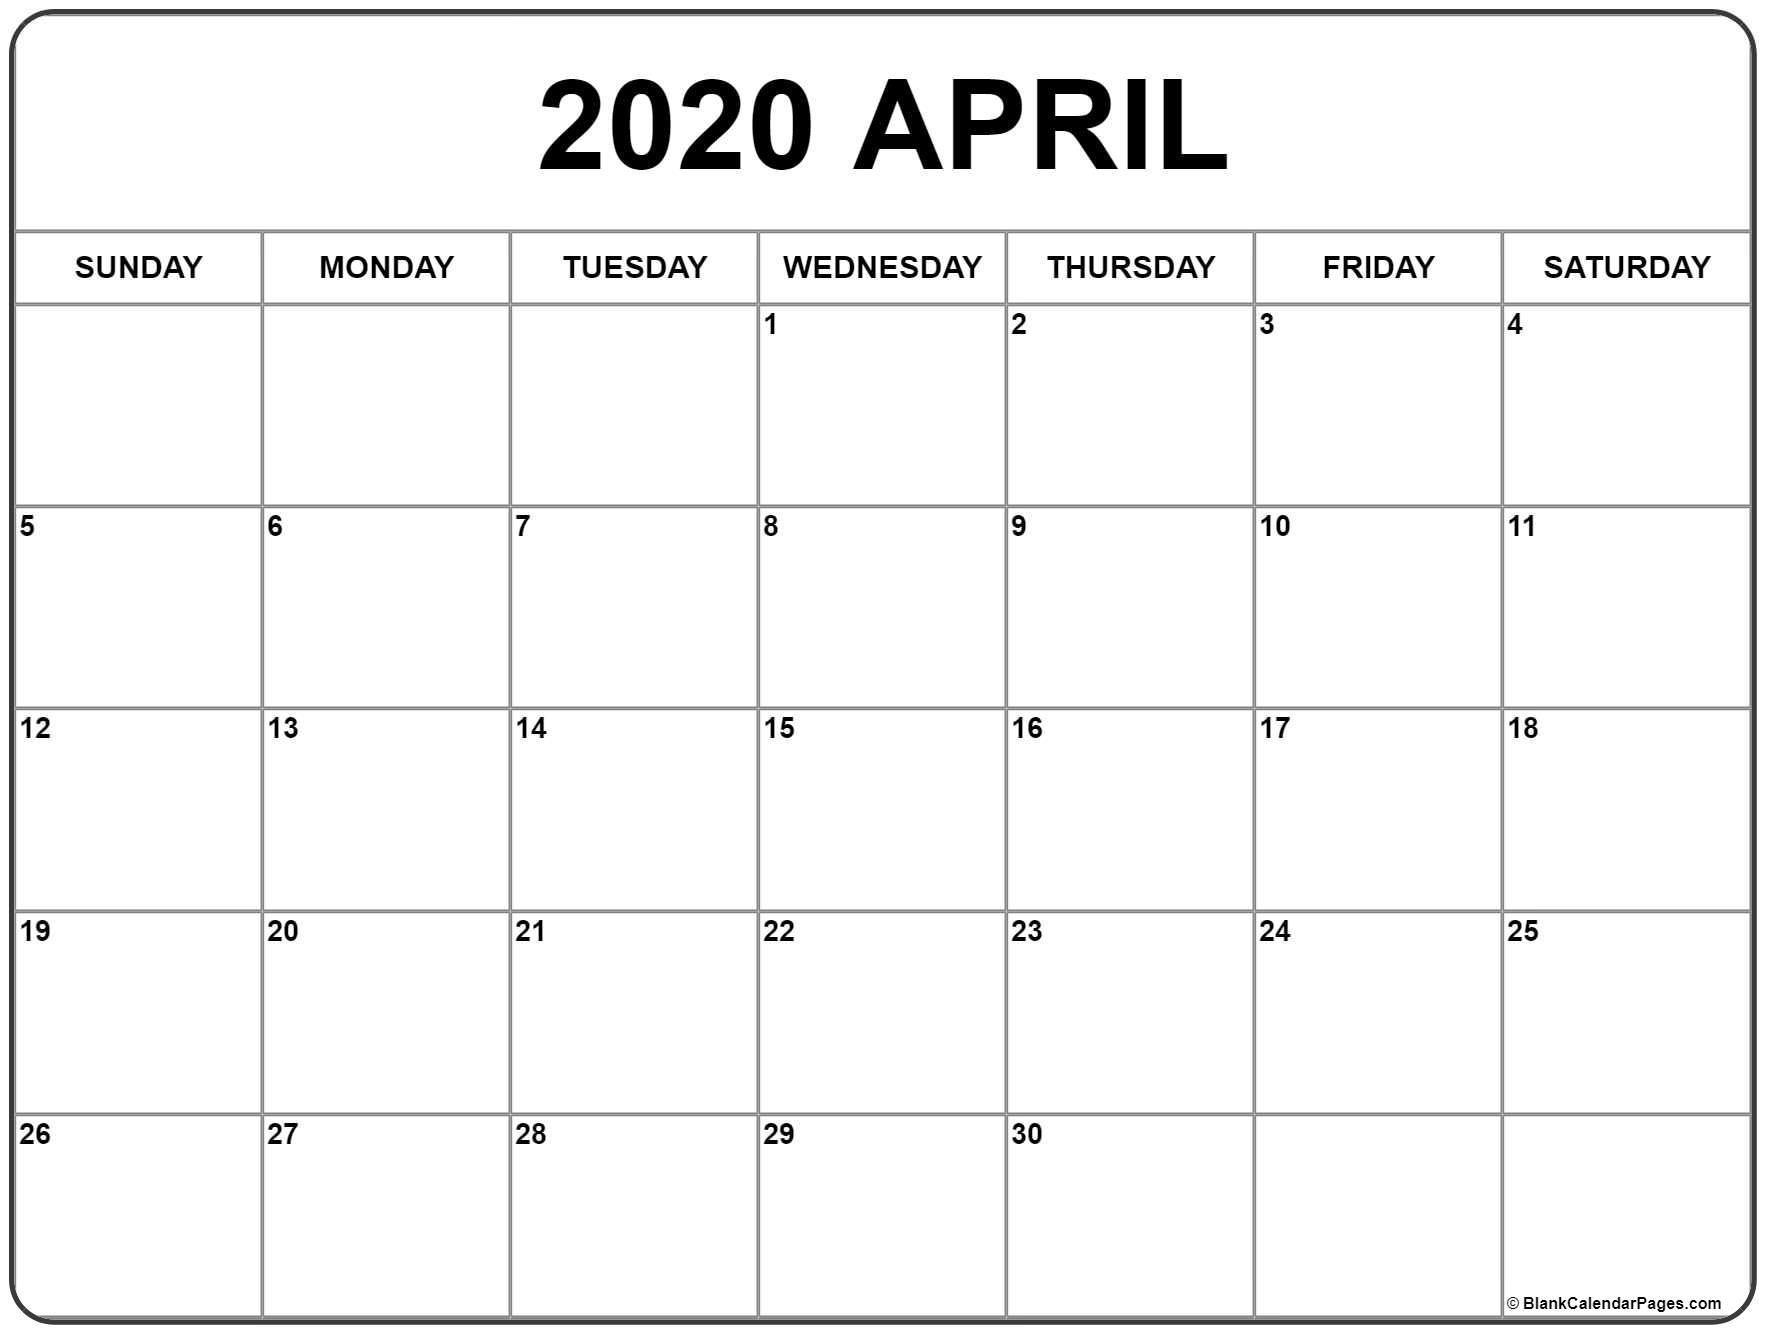 Printable Calendars April 2020  Bolan.horizonconsulting.co inside Free Printable April 2020 Calendar